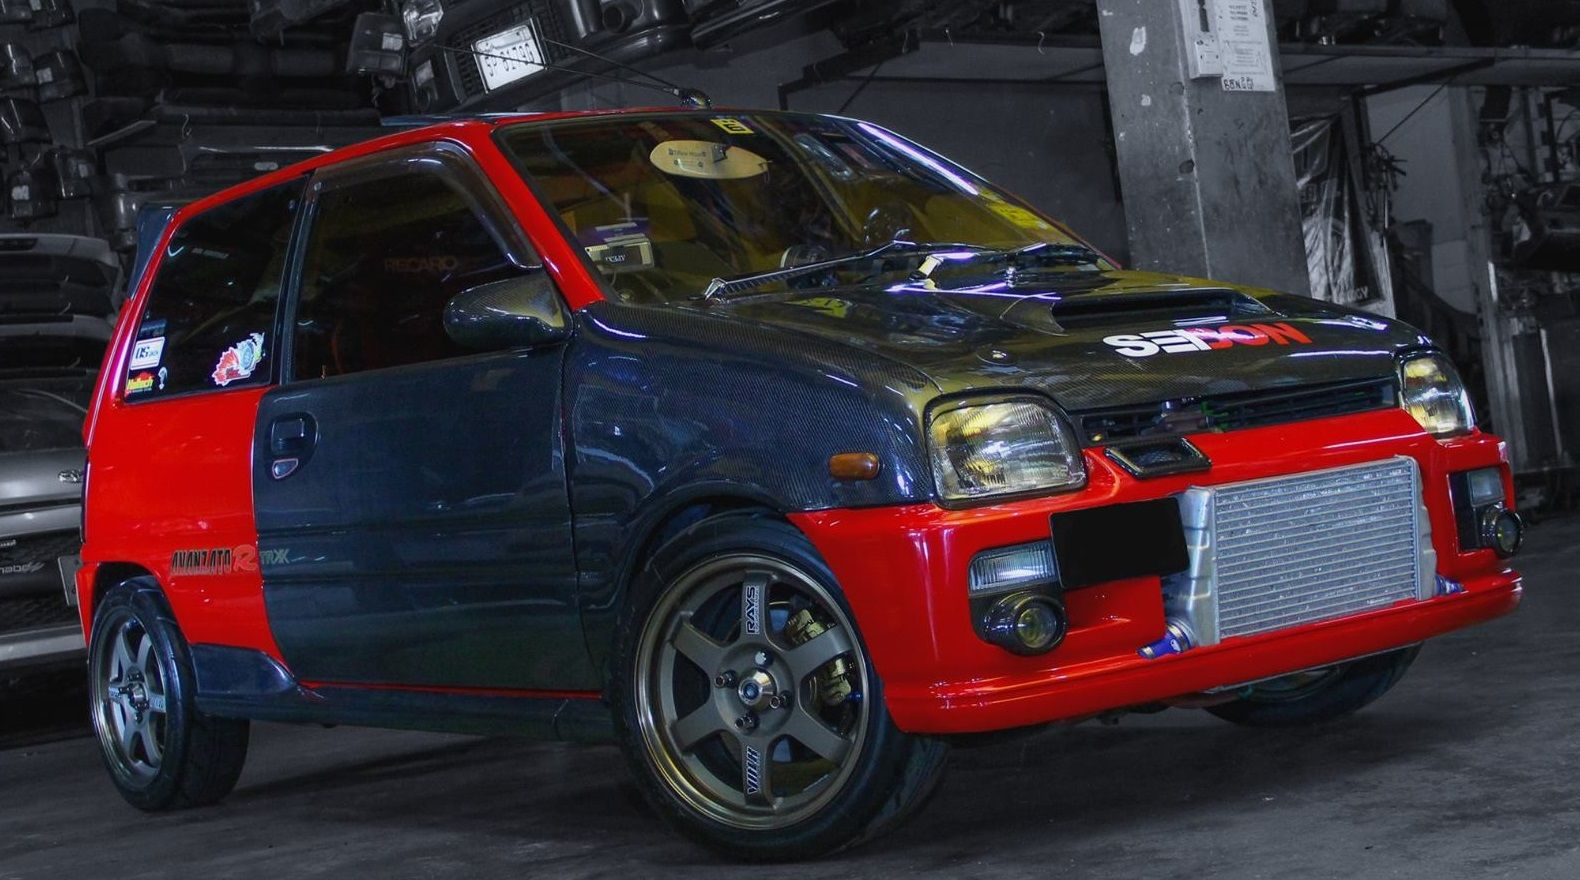 Modified Daihatsu Mira Perodua Kancil 2 Doors Turbo Kancilturbo